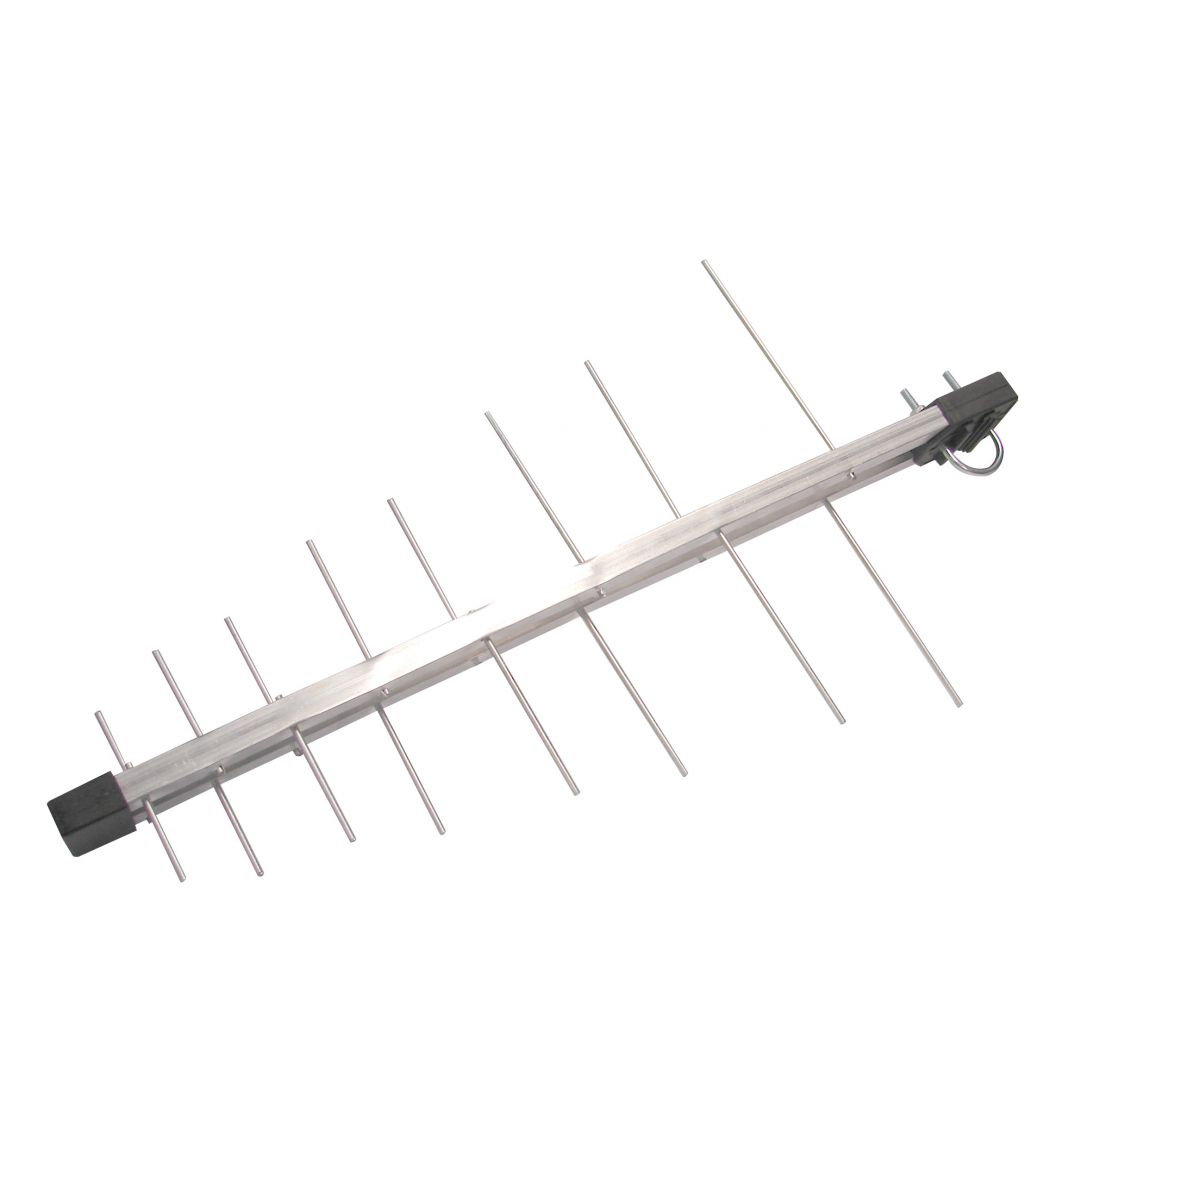 Kit Antena Tv Digital 4K Externa Log 16 Elementos c/ Mastro Articulado 45 cm e Cabo Coaxial Capte 12 metros